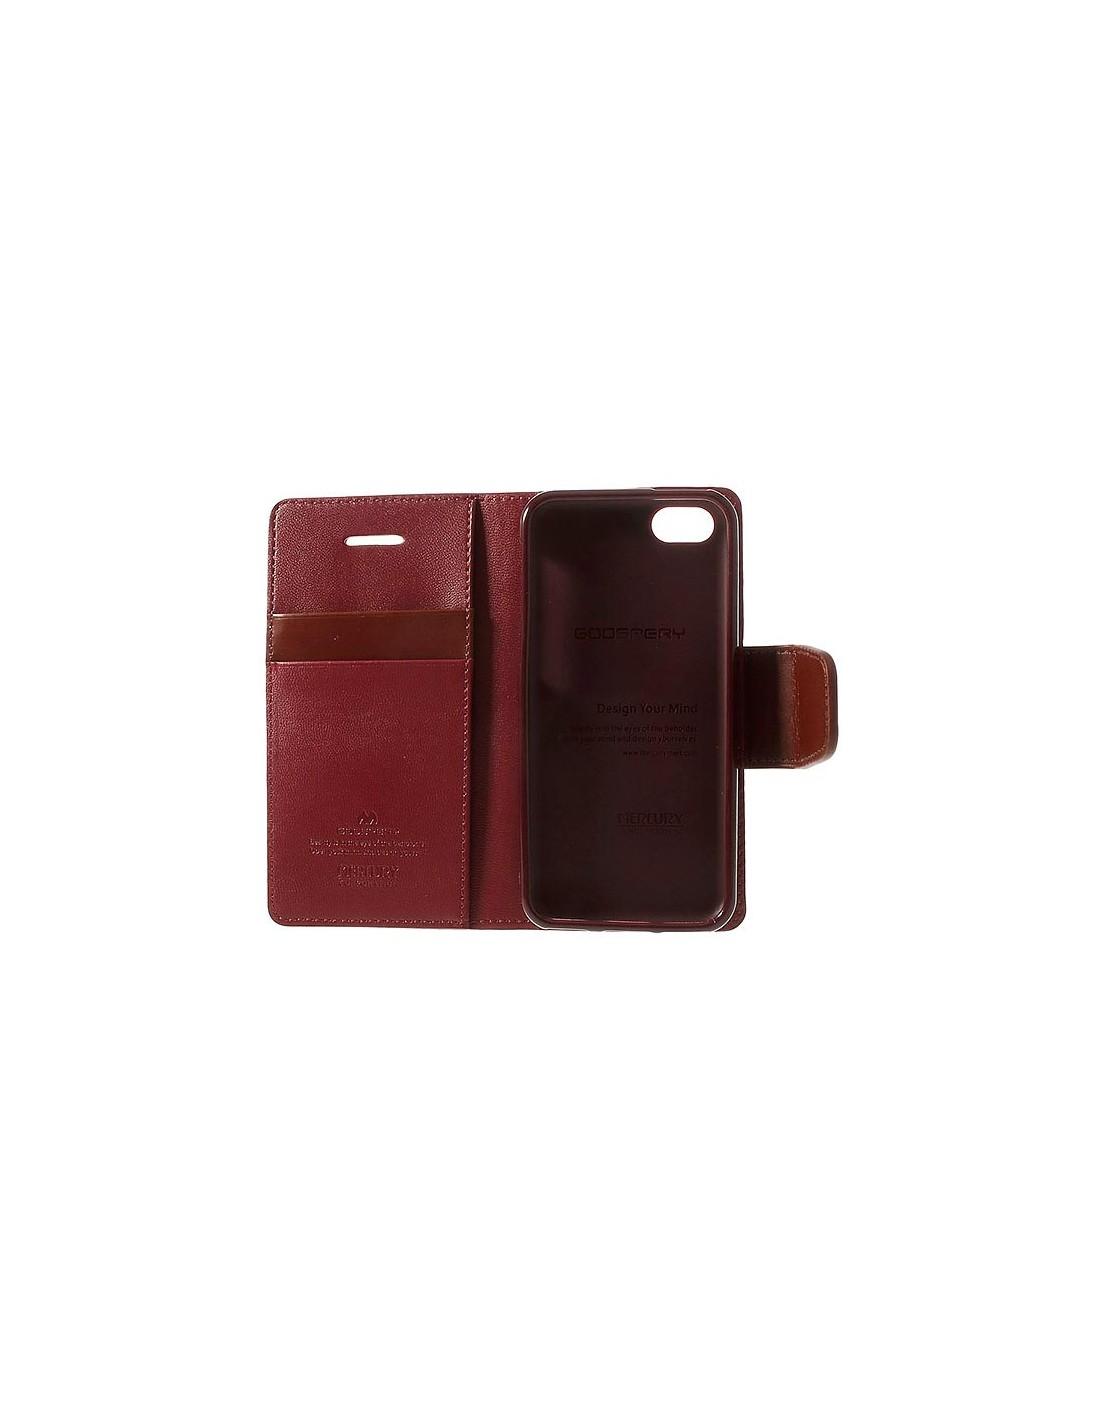 Etui iphone 5c cuir - Achat / Vente pas cher Coque cuir iphone 5c - Achat / Vente pas cher Housse Cuir iPhone 5C Protection Luxe - Issentiel